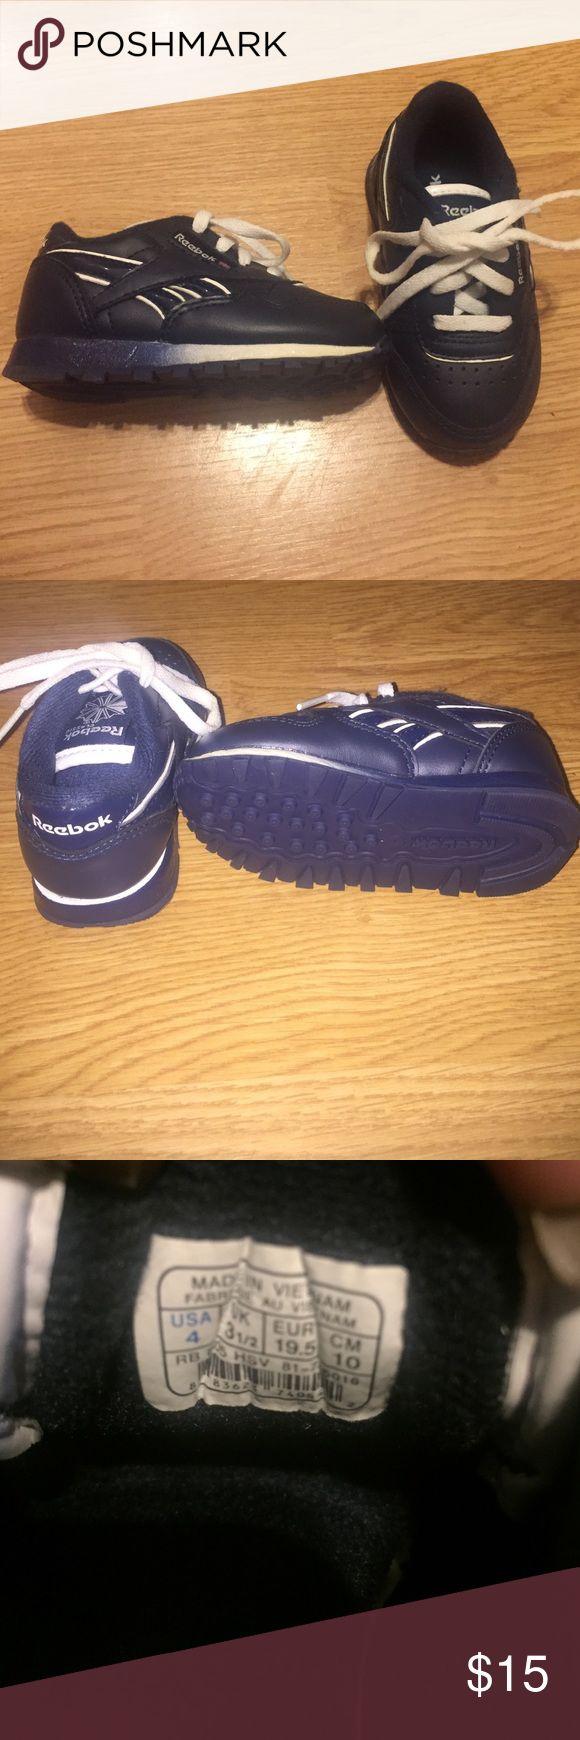 Children's Reebok classic Sneakers Blue children's sneakers size 4 Reebok Shoes Sneakers